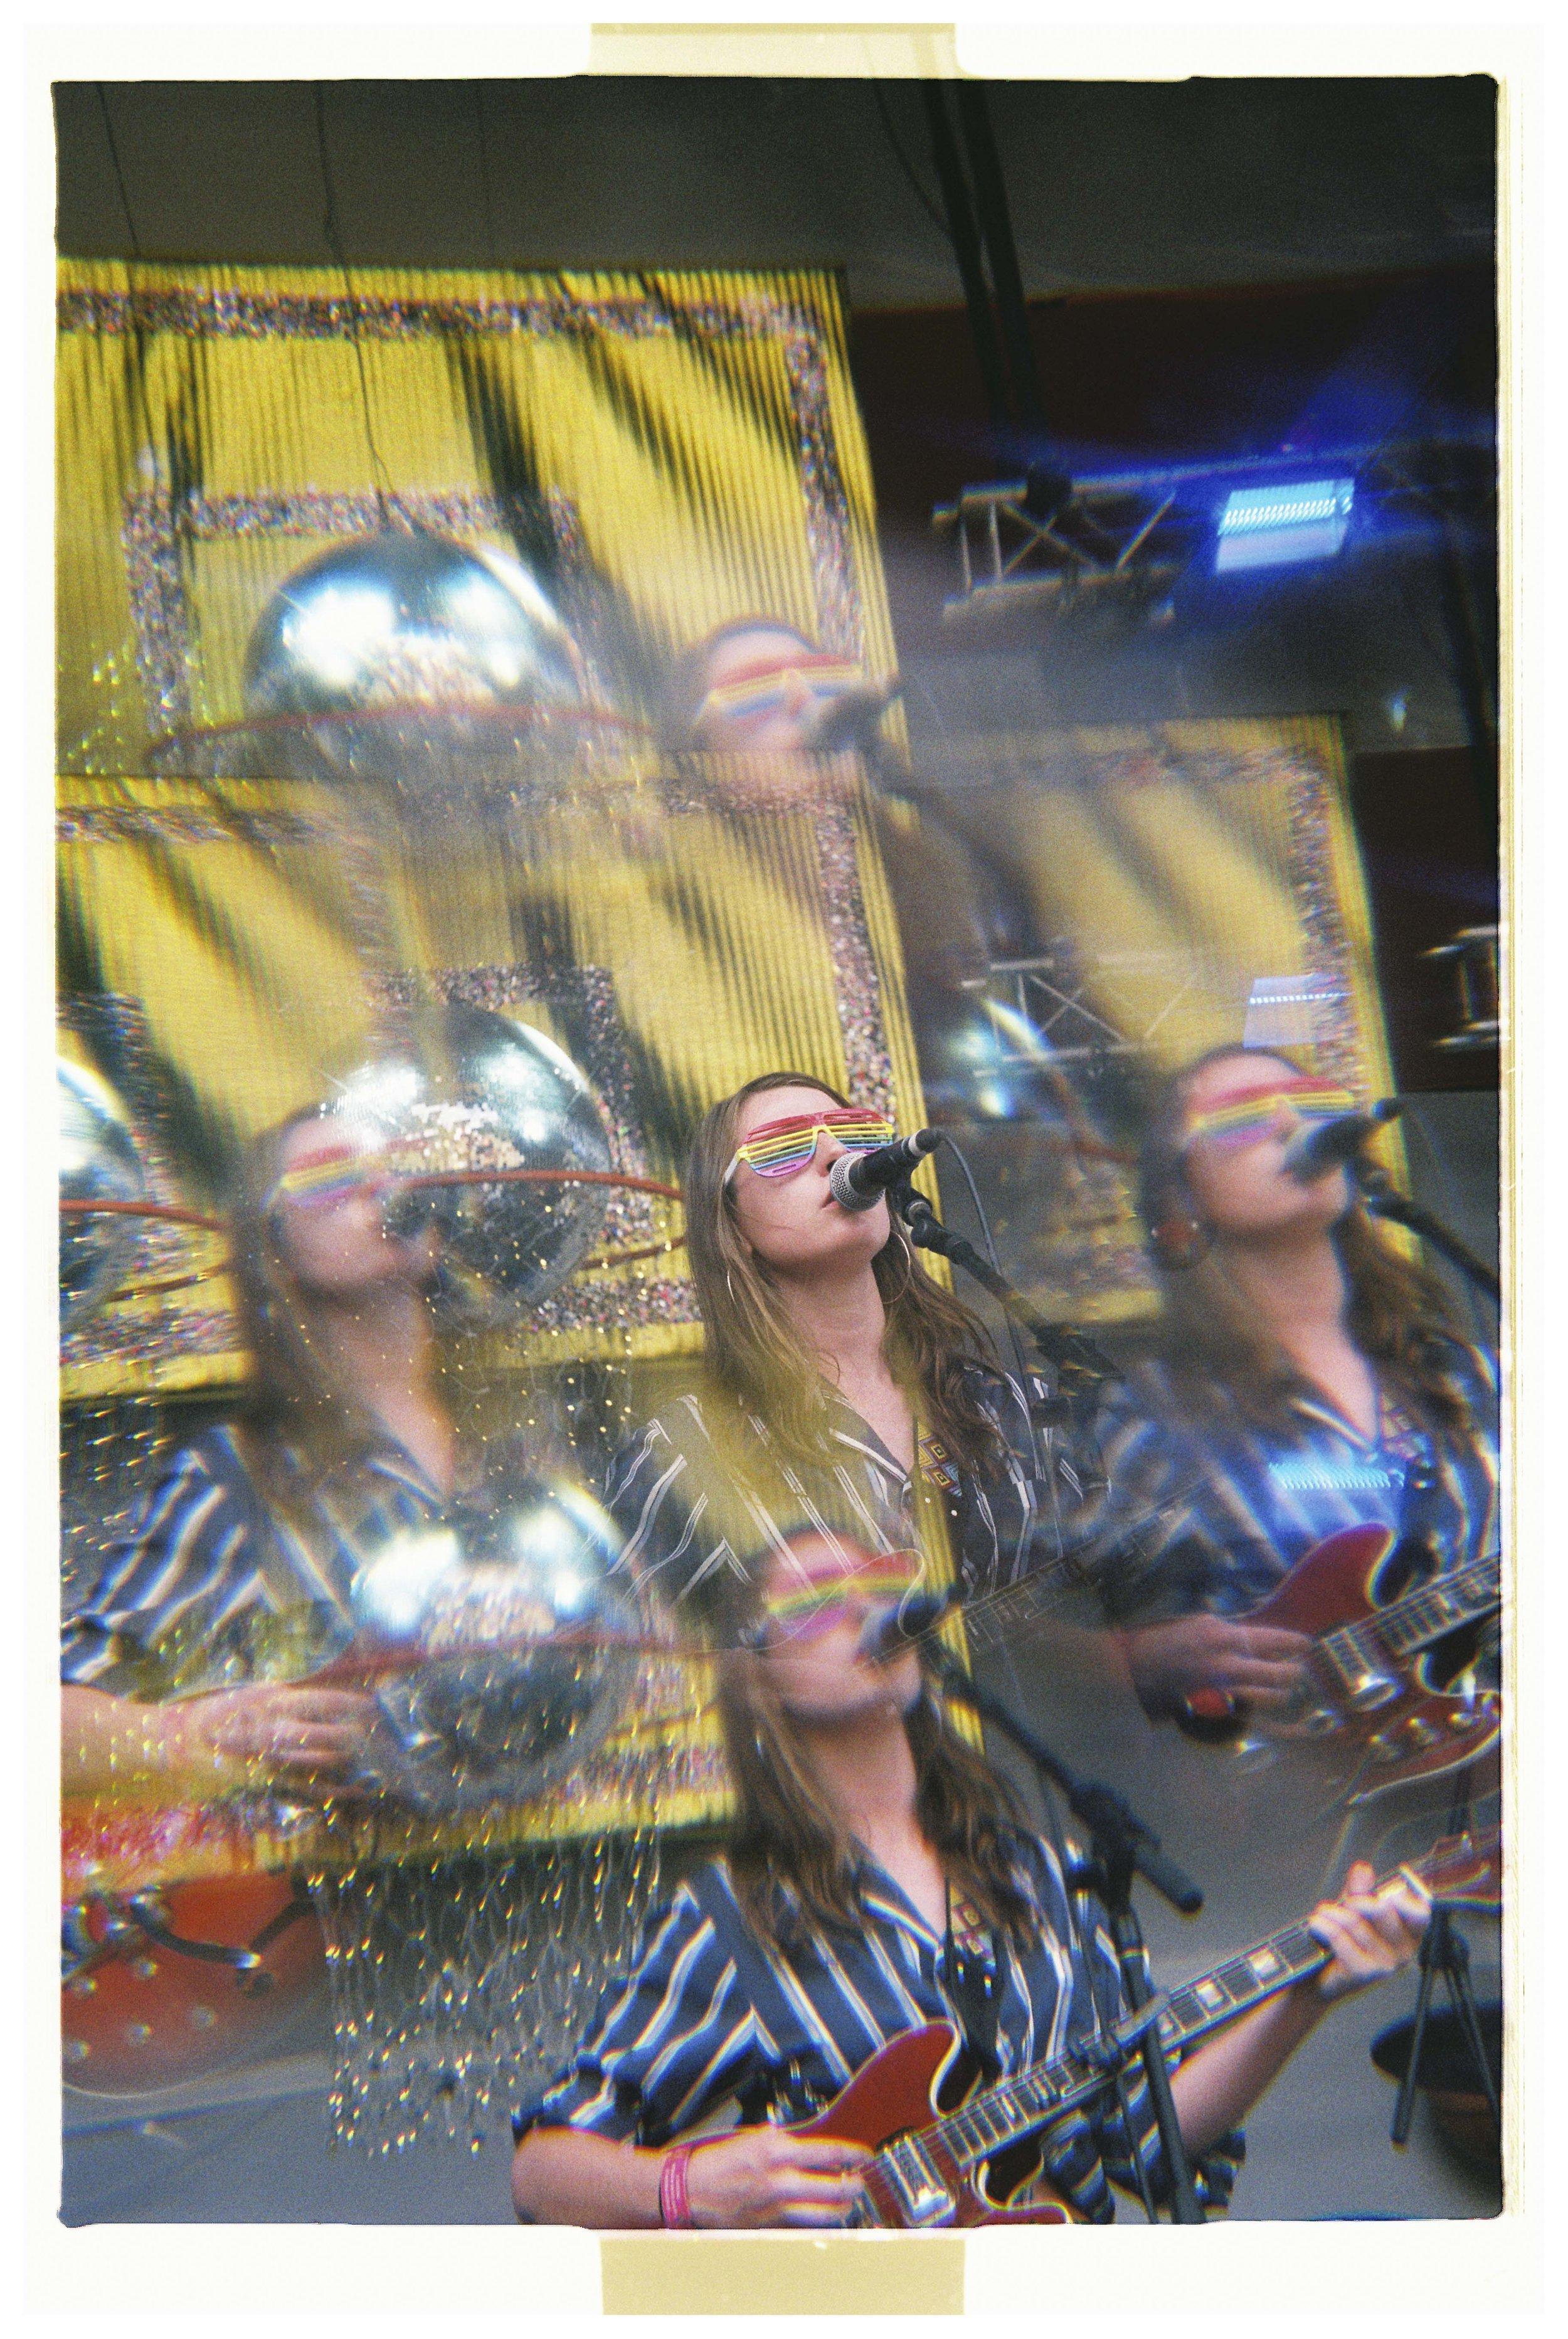 Angie McMahon - Nikon F3 - Fuji Superia Xtra 400 - 4.jpg